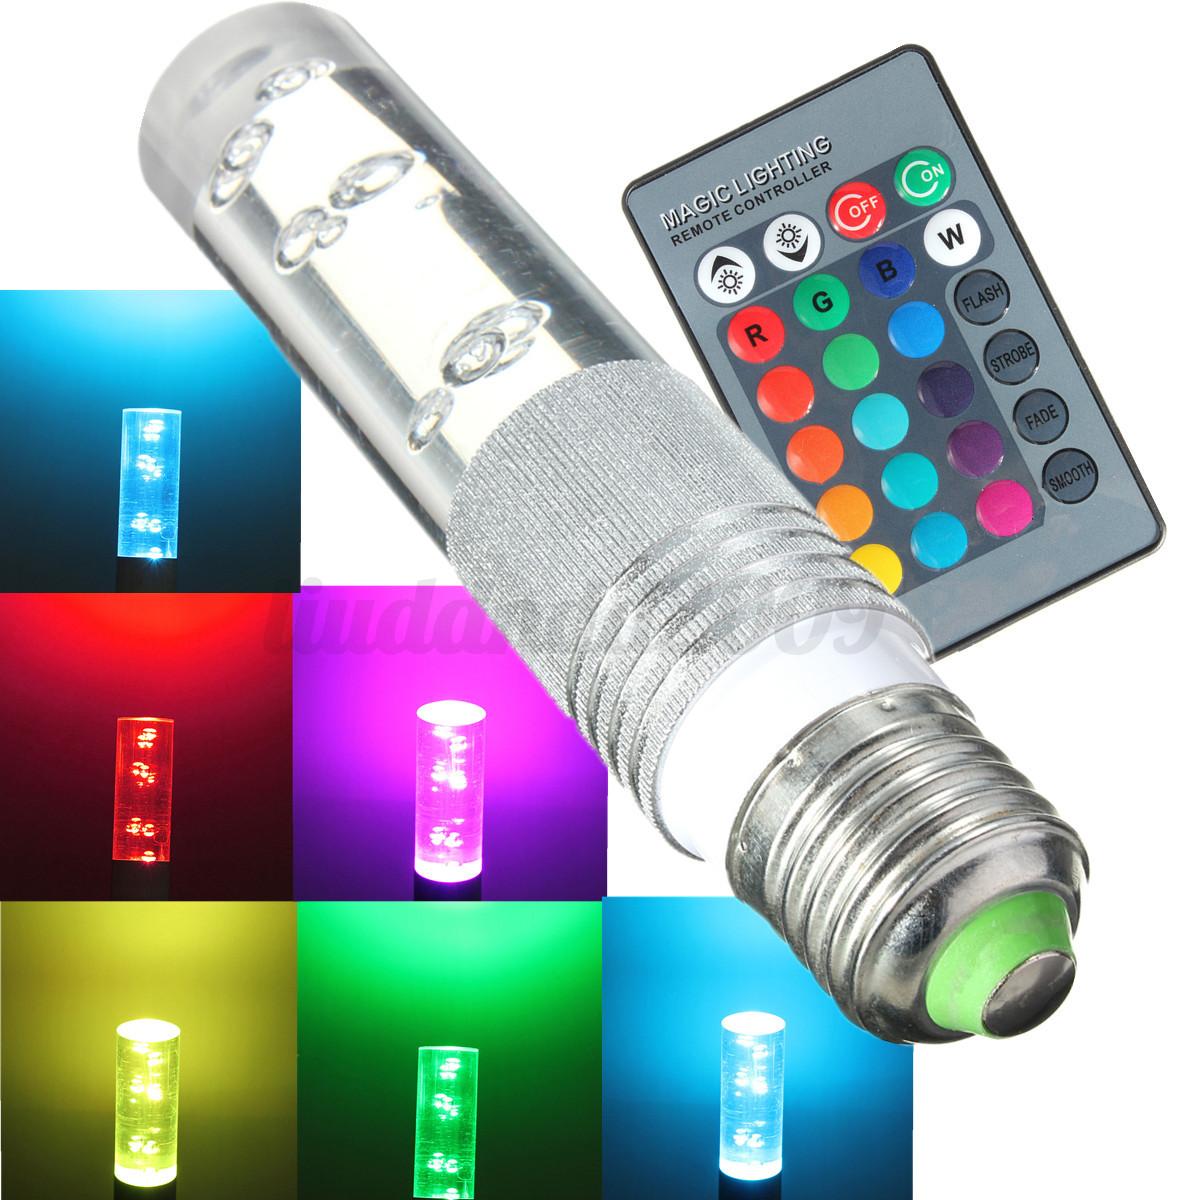 3w e27 led rgb strahler beleuchtung leuchte hause lampe 16 farbe fernbedienung ebay. Black Bedroom Furniture Sets. Home Design Ideas